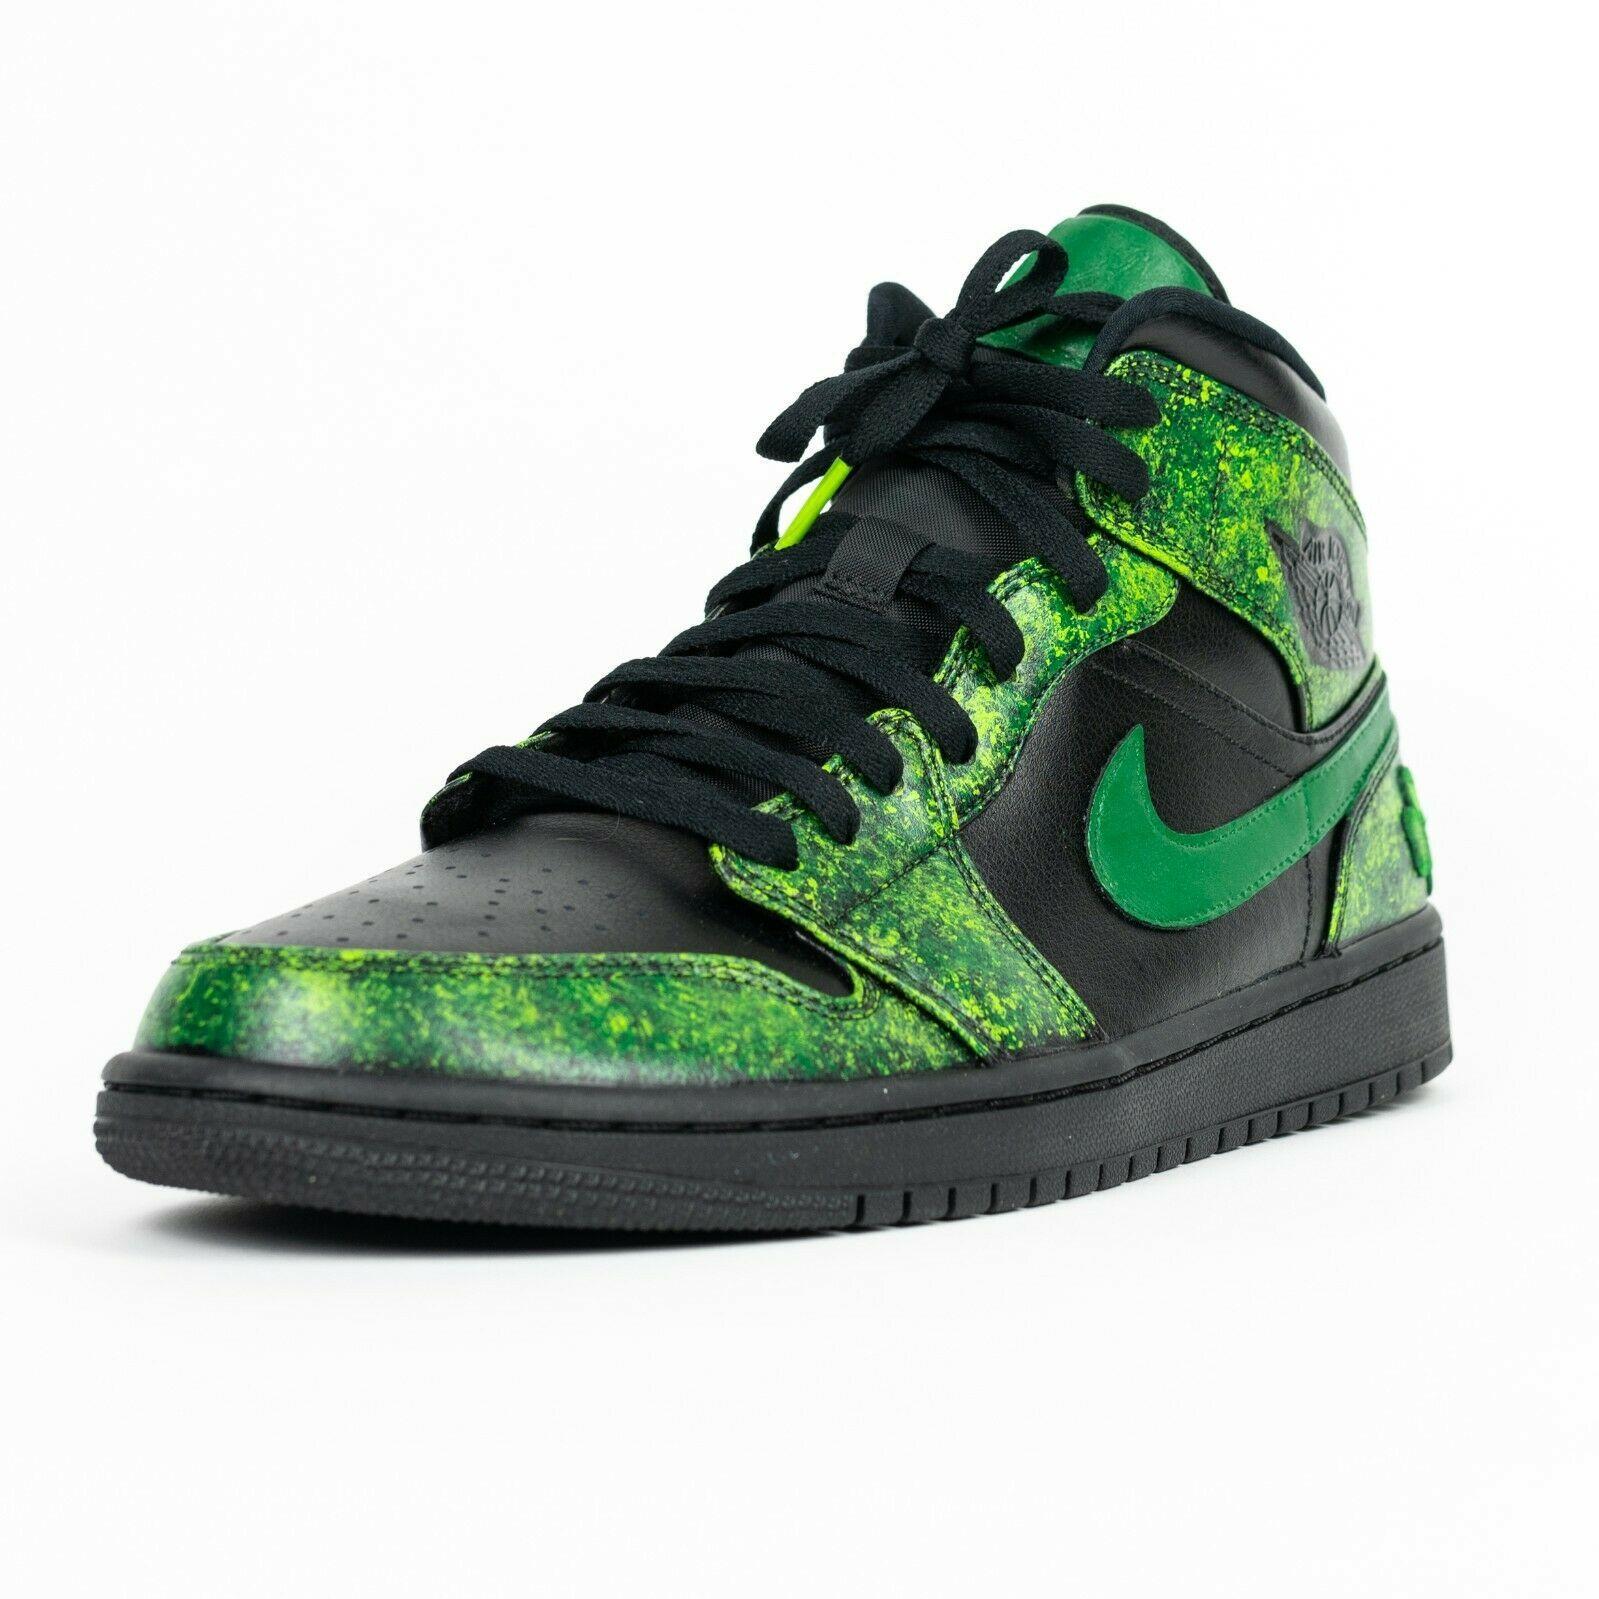 Jordan 1 Mid Black Mens Custom 'Irish' Shoes All Sizes 4 ...